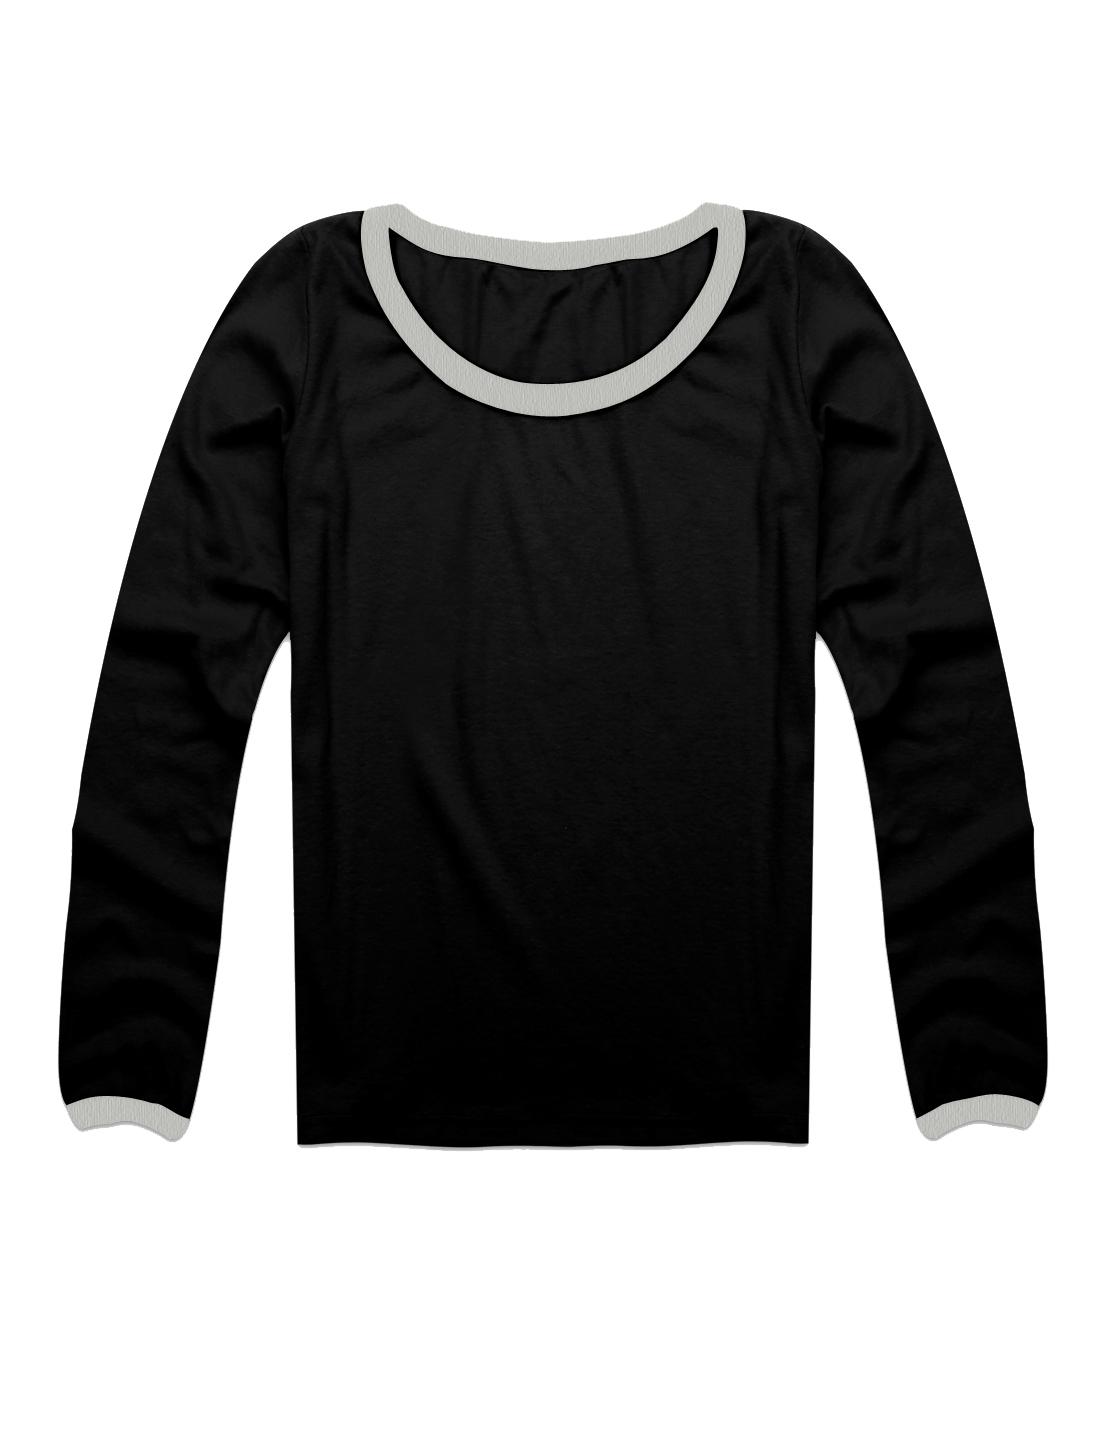 Women Korea Style Pullover Solid Black Formfitting Skivvi Blouse XS